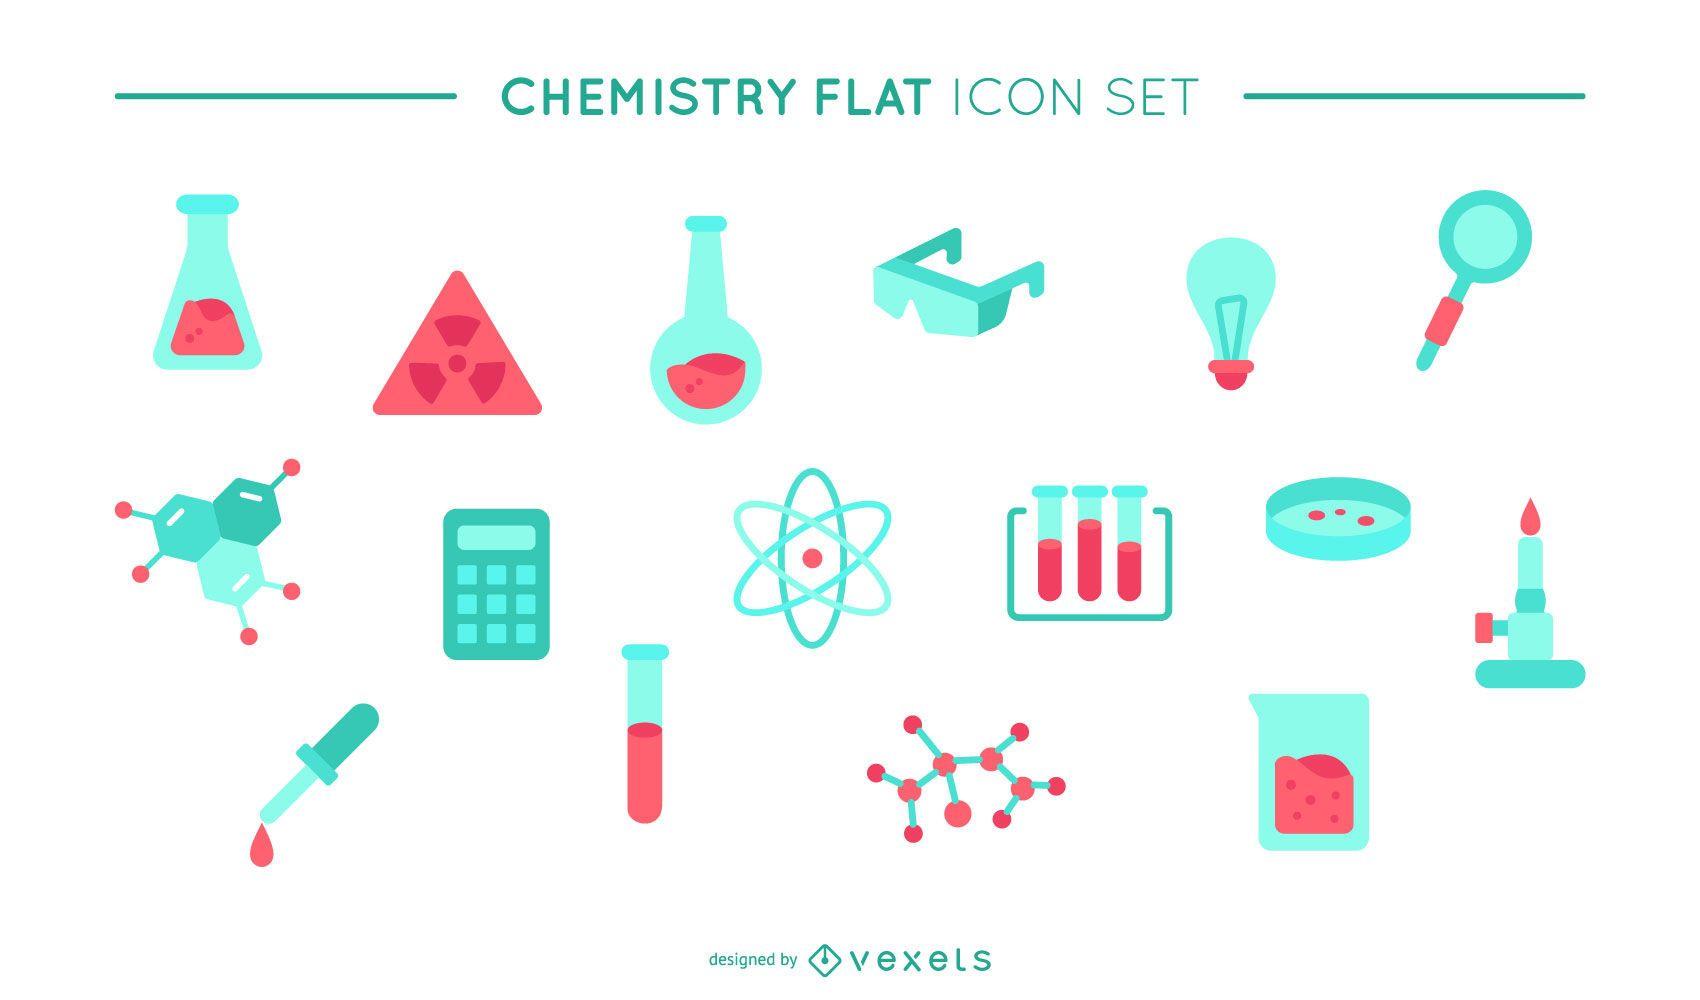 Chemistry flat icon set